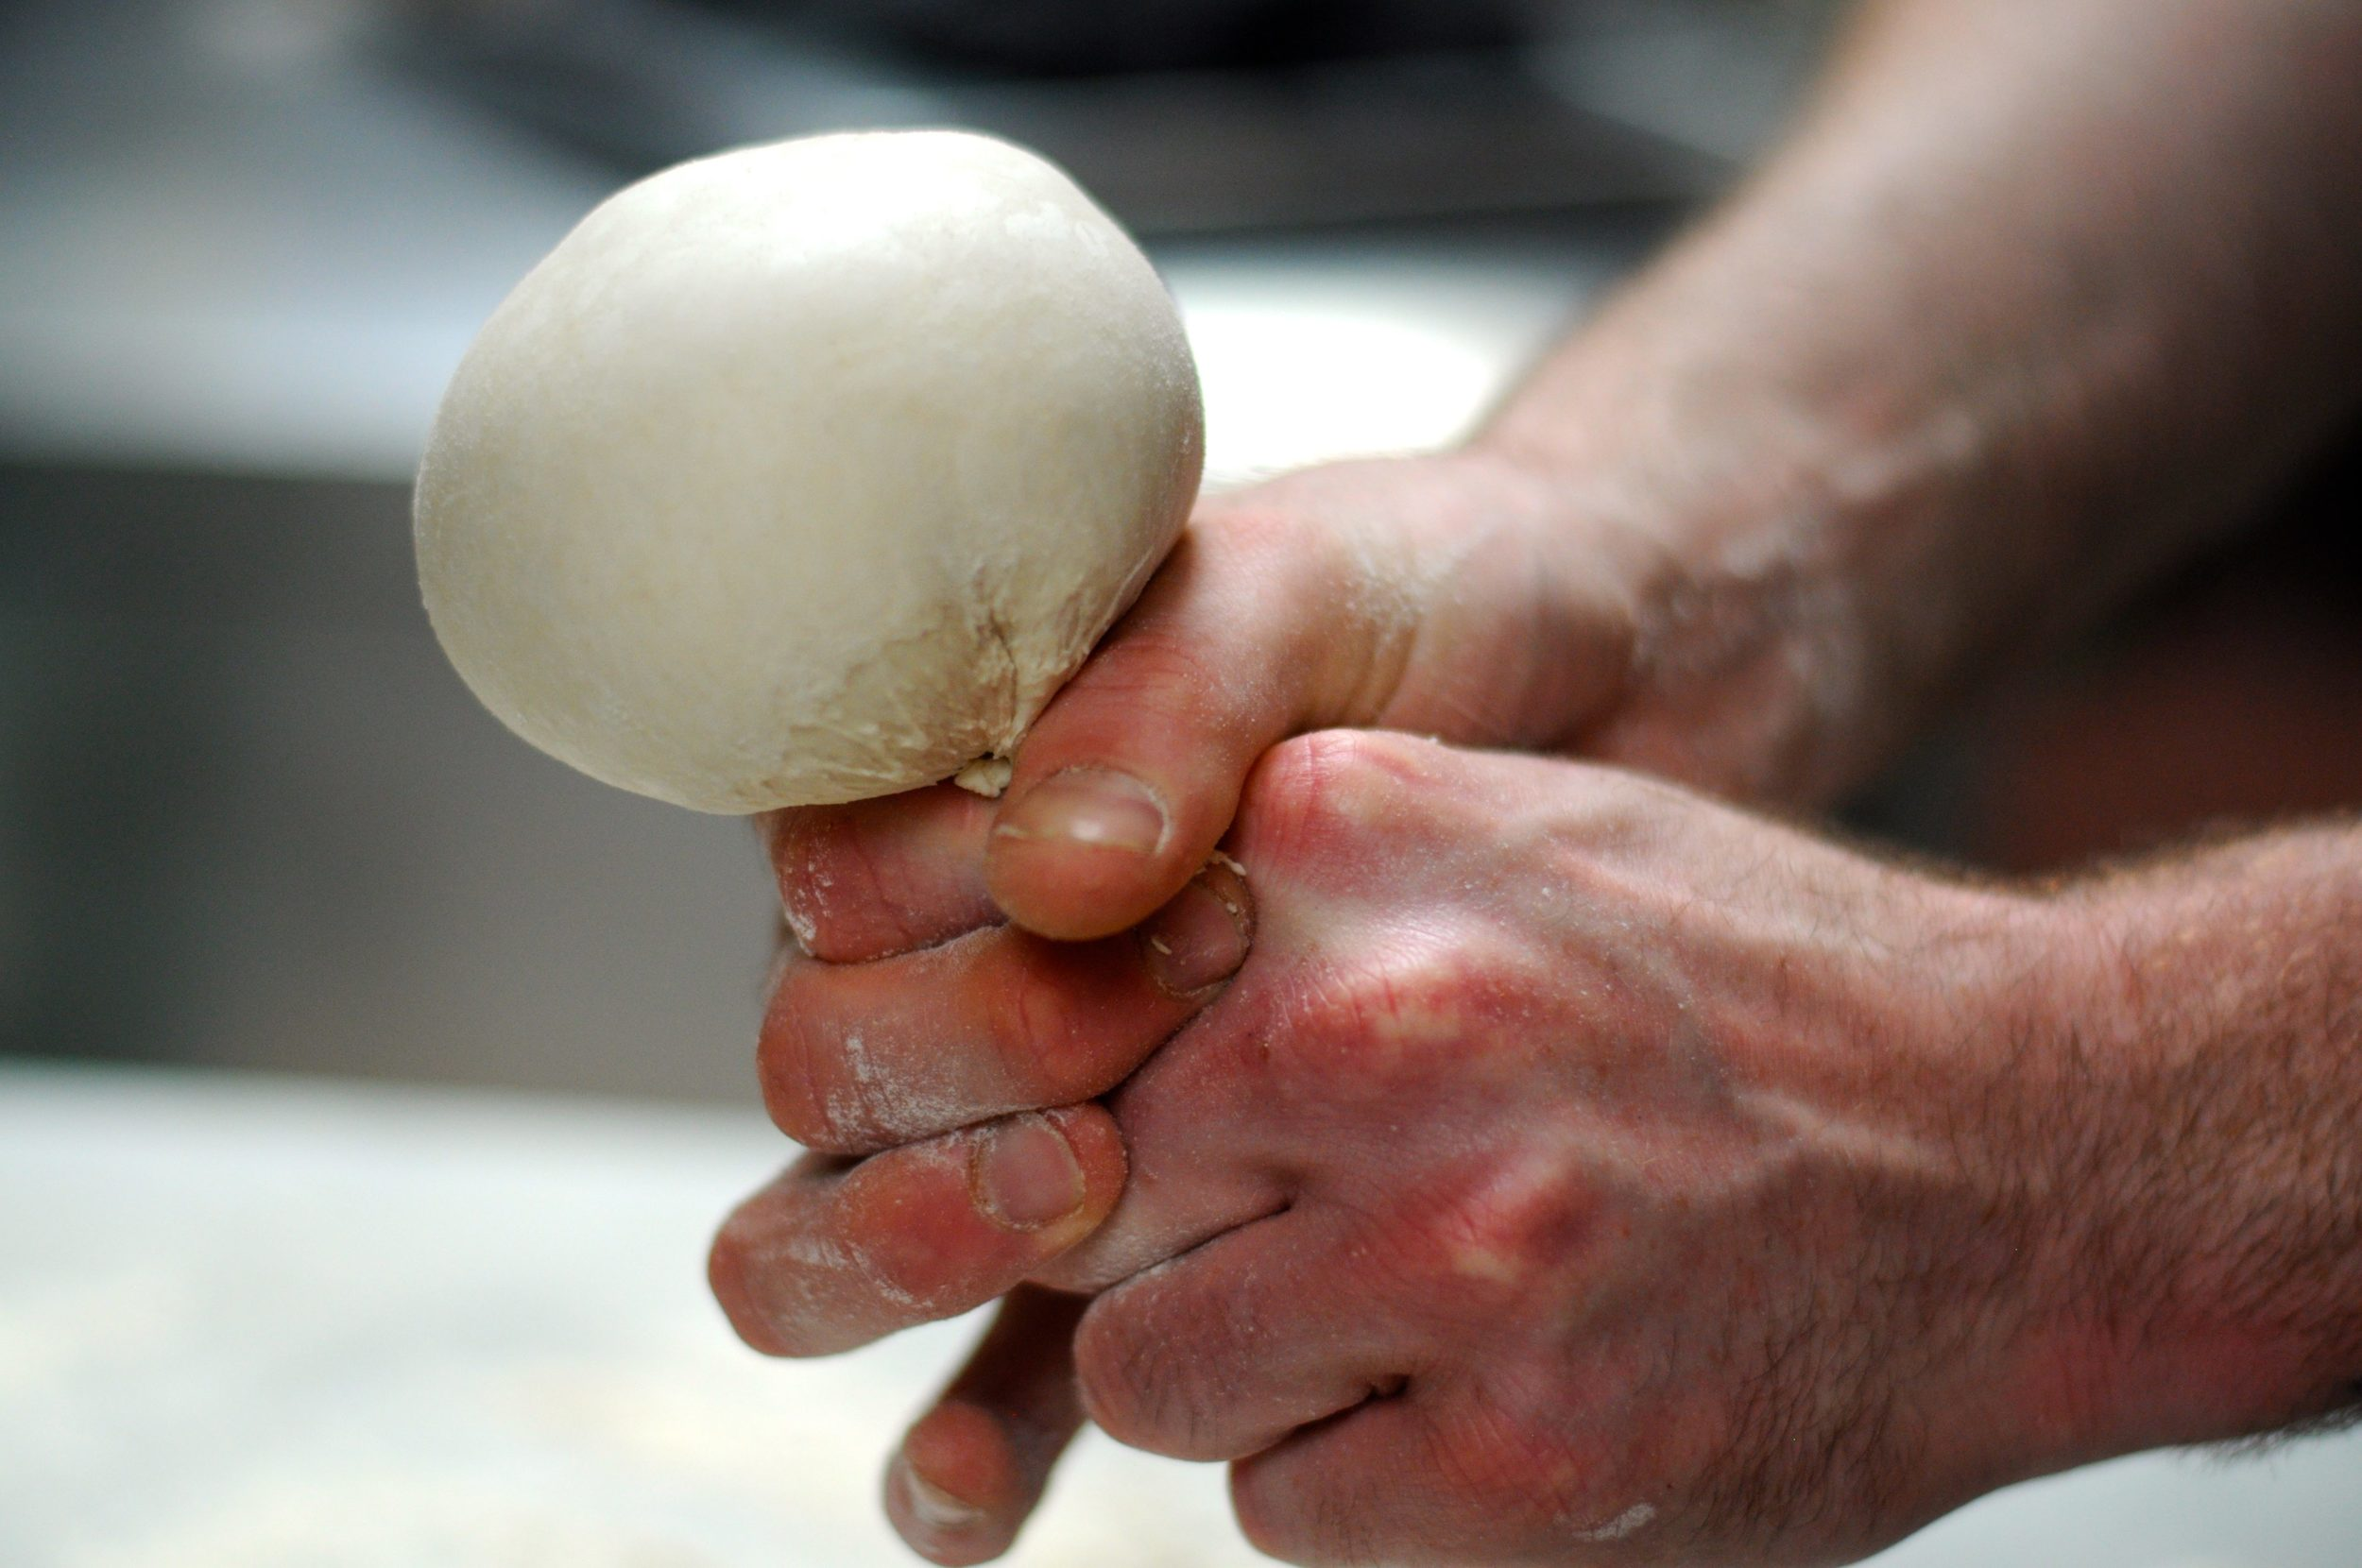 a16-pinch-the-dough.jpg